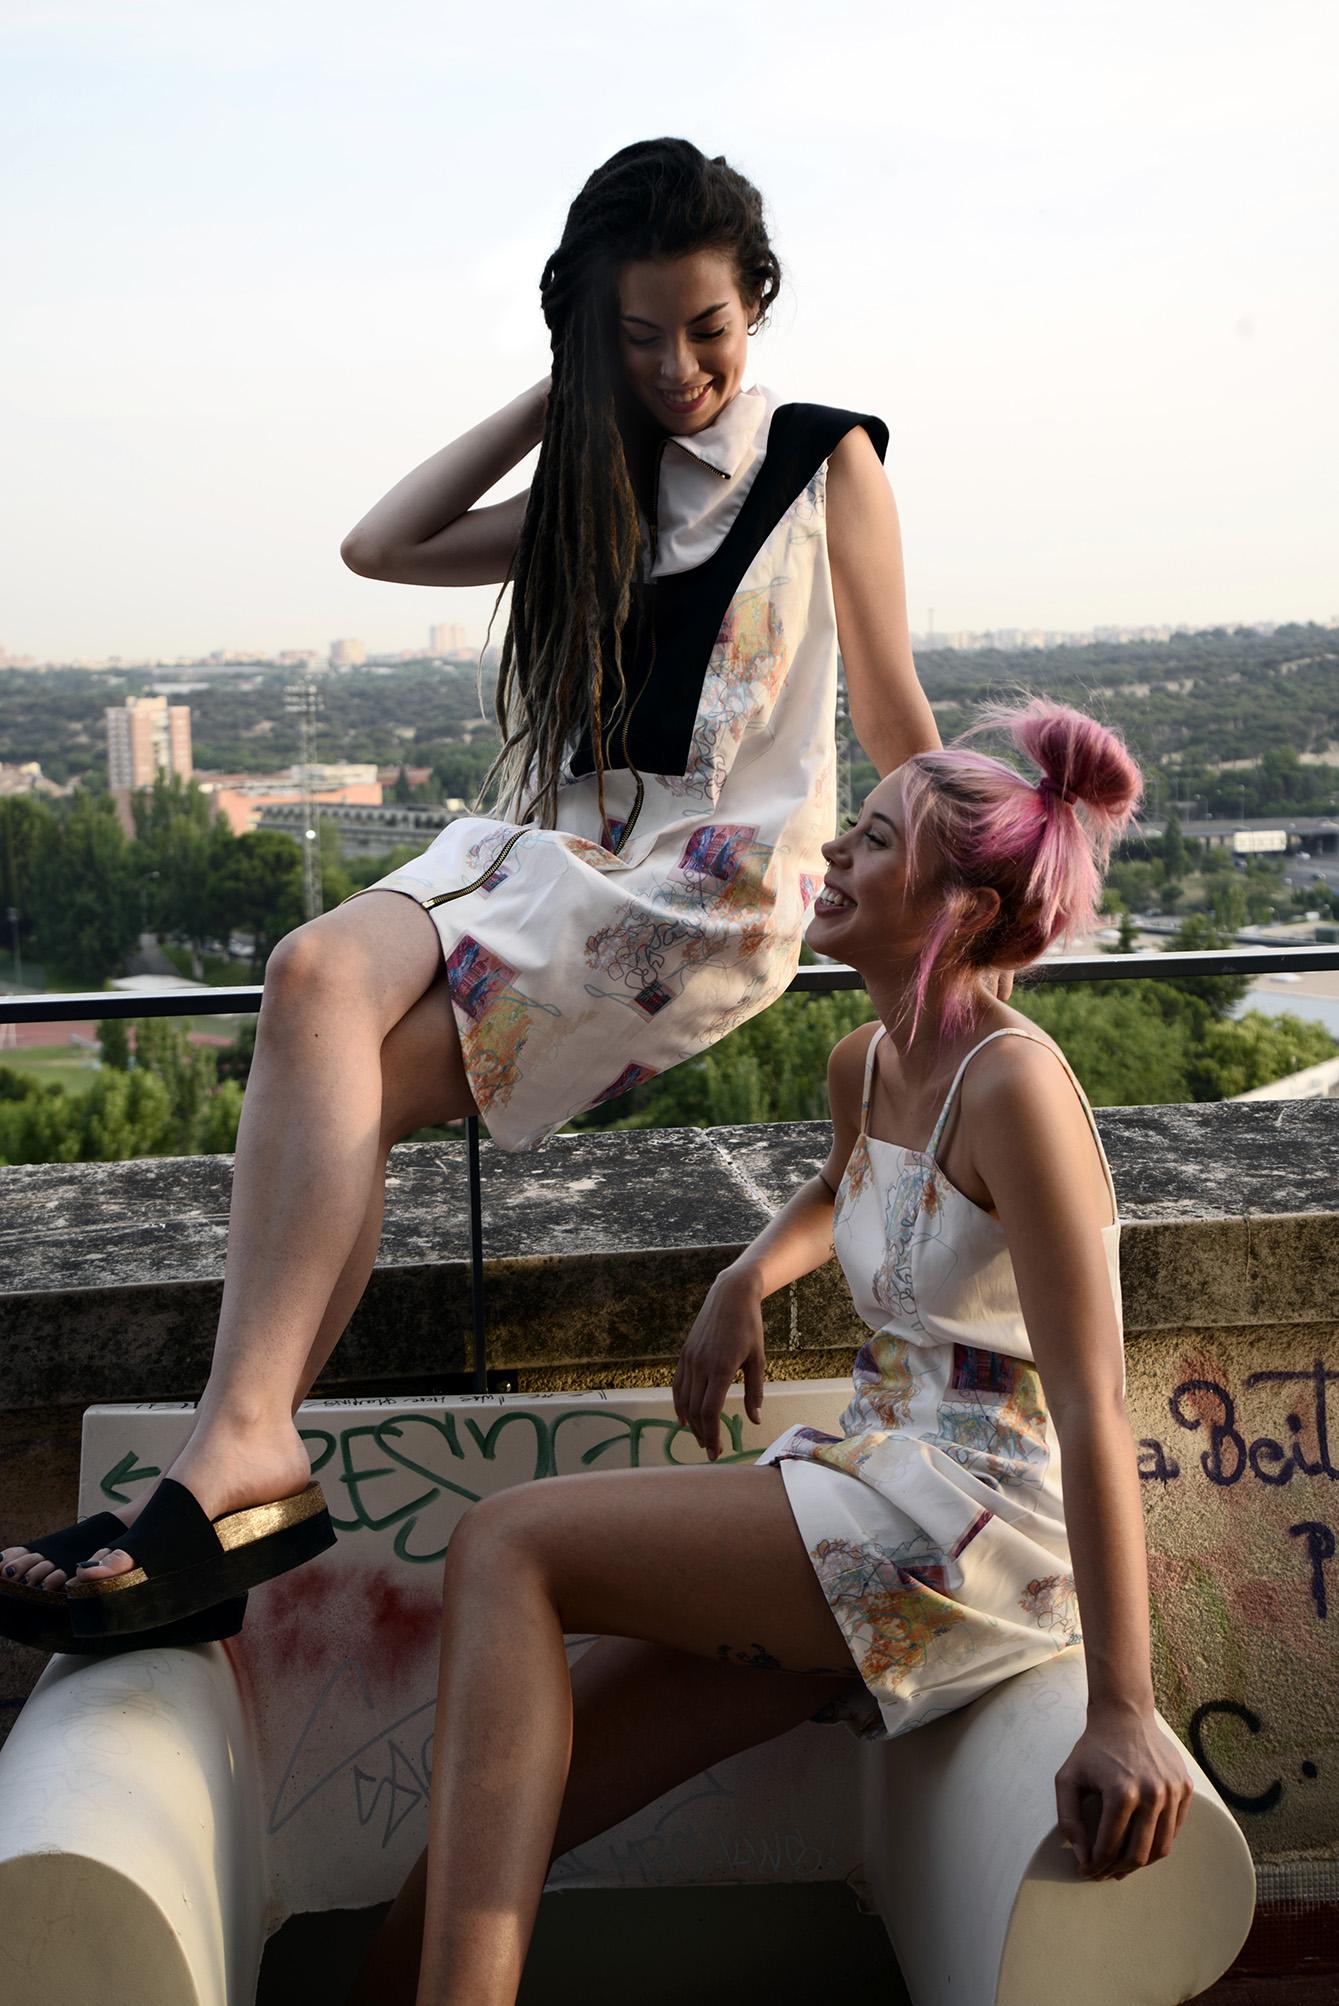 Florencia Fumagalli - Dem Collection 3